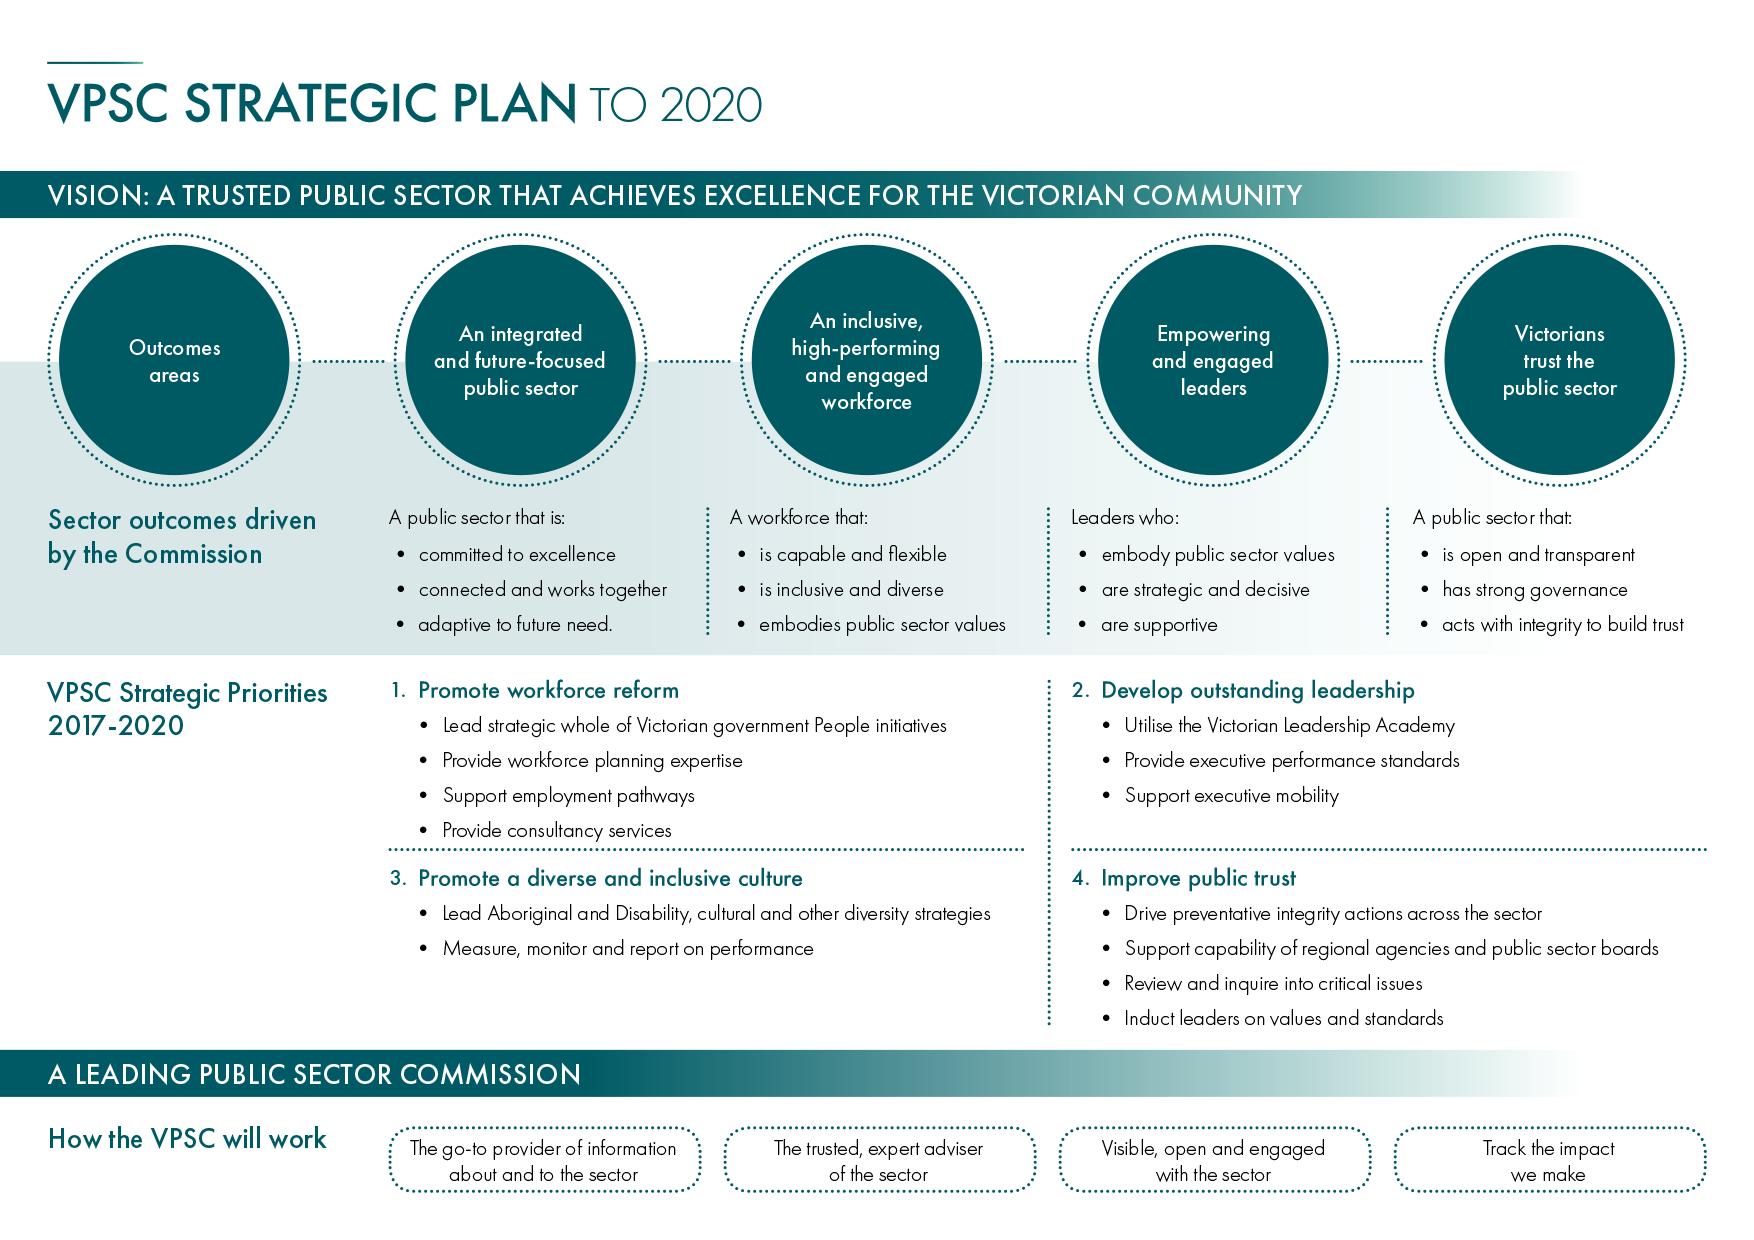 strategic plan to 2020 vpsc